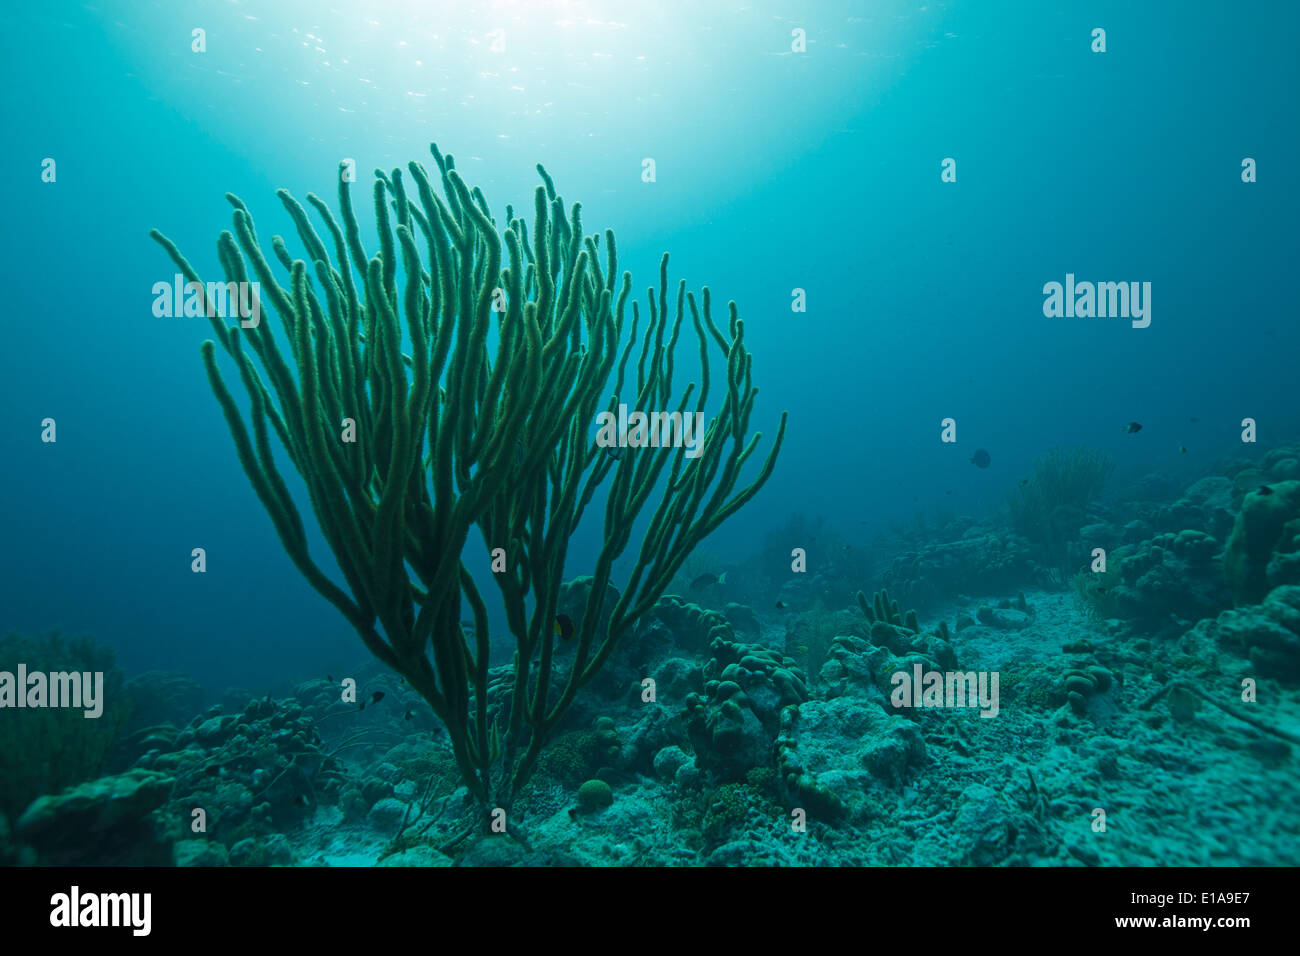 Riesigen Meer Stab (Plexaurella Nutans) in der Karibik auf Bonaire. Tauchplatz Andrea 1. Grote Zeeroede. Stockbild